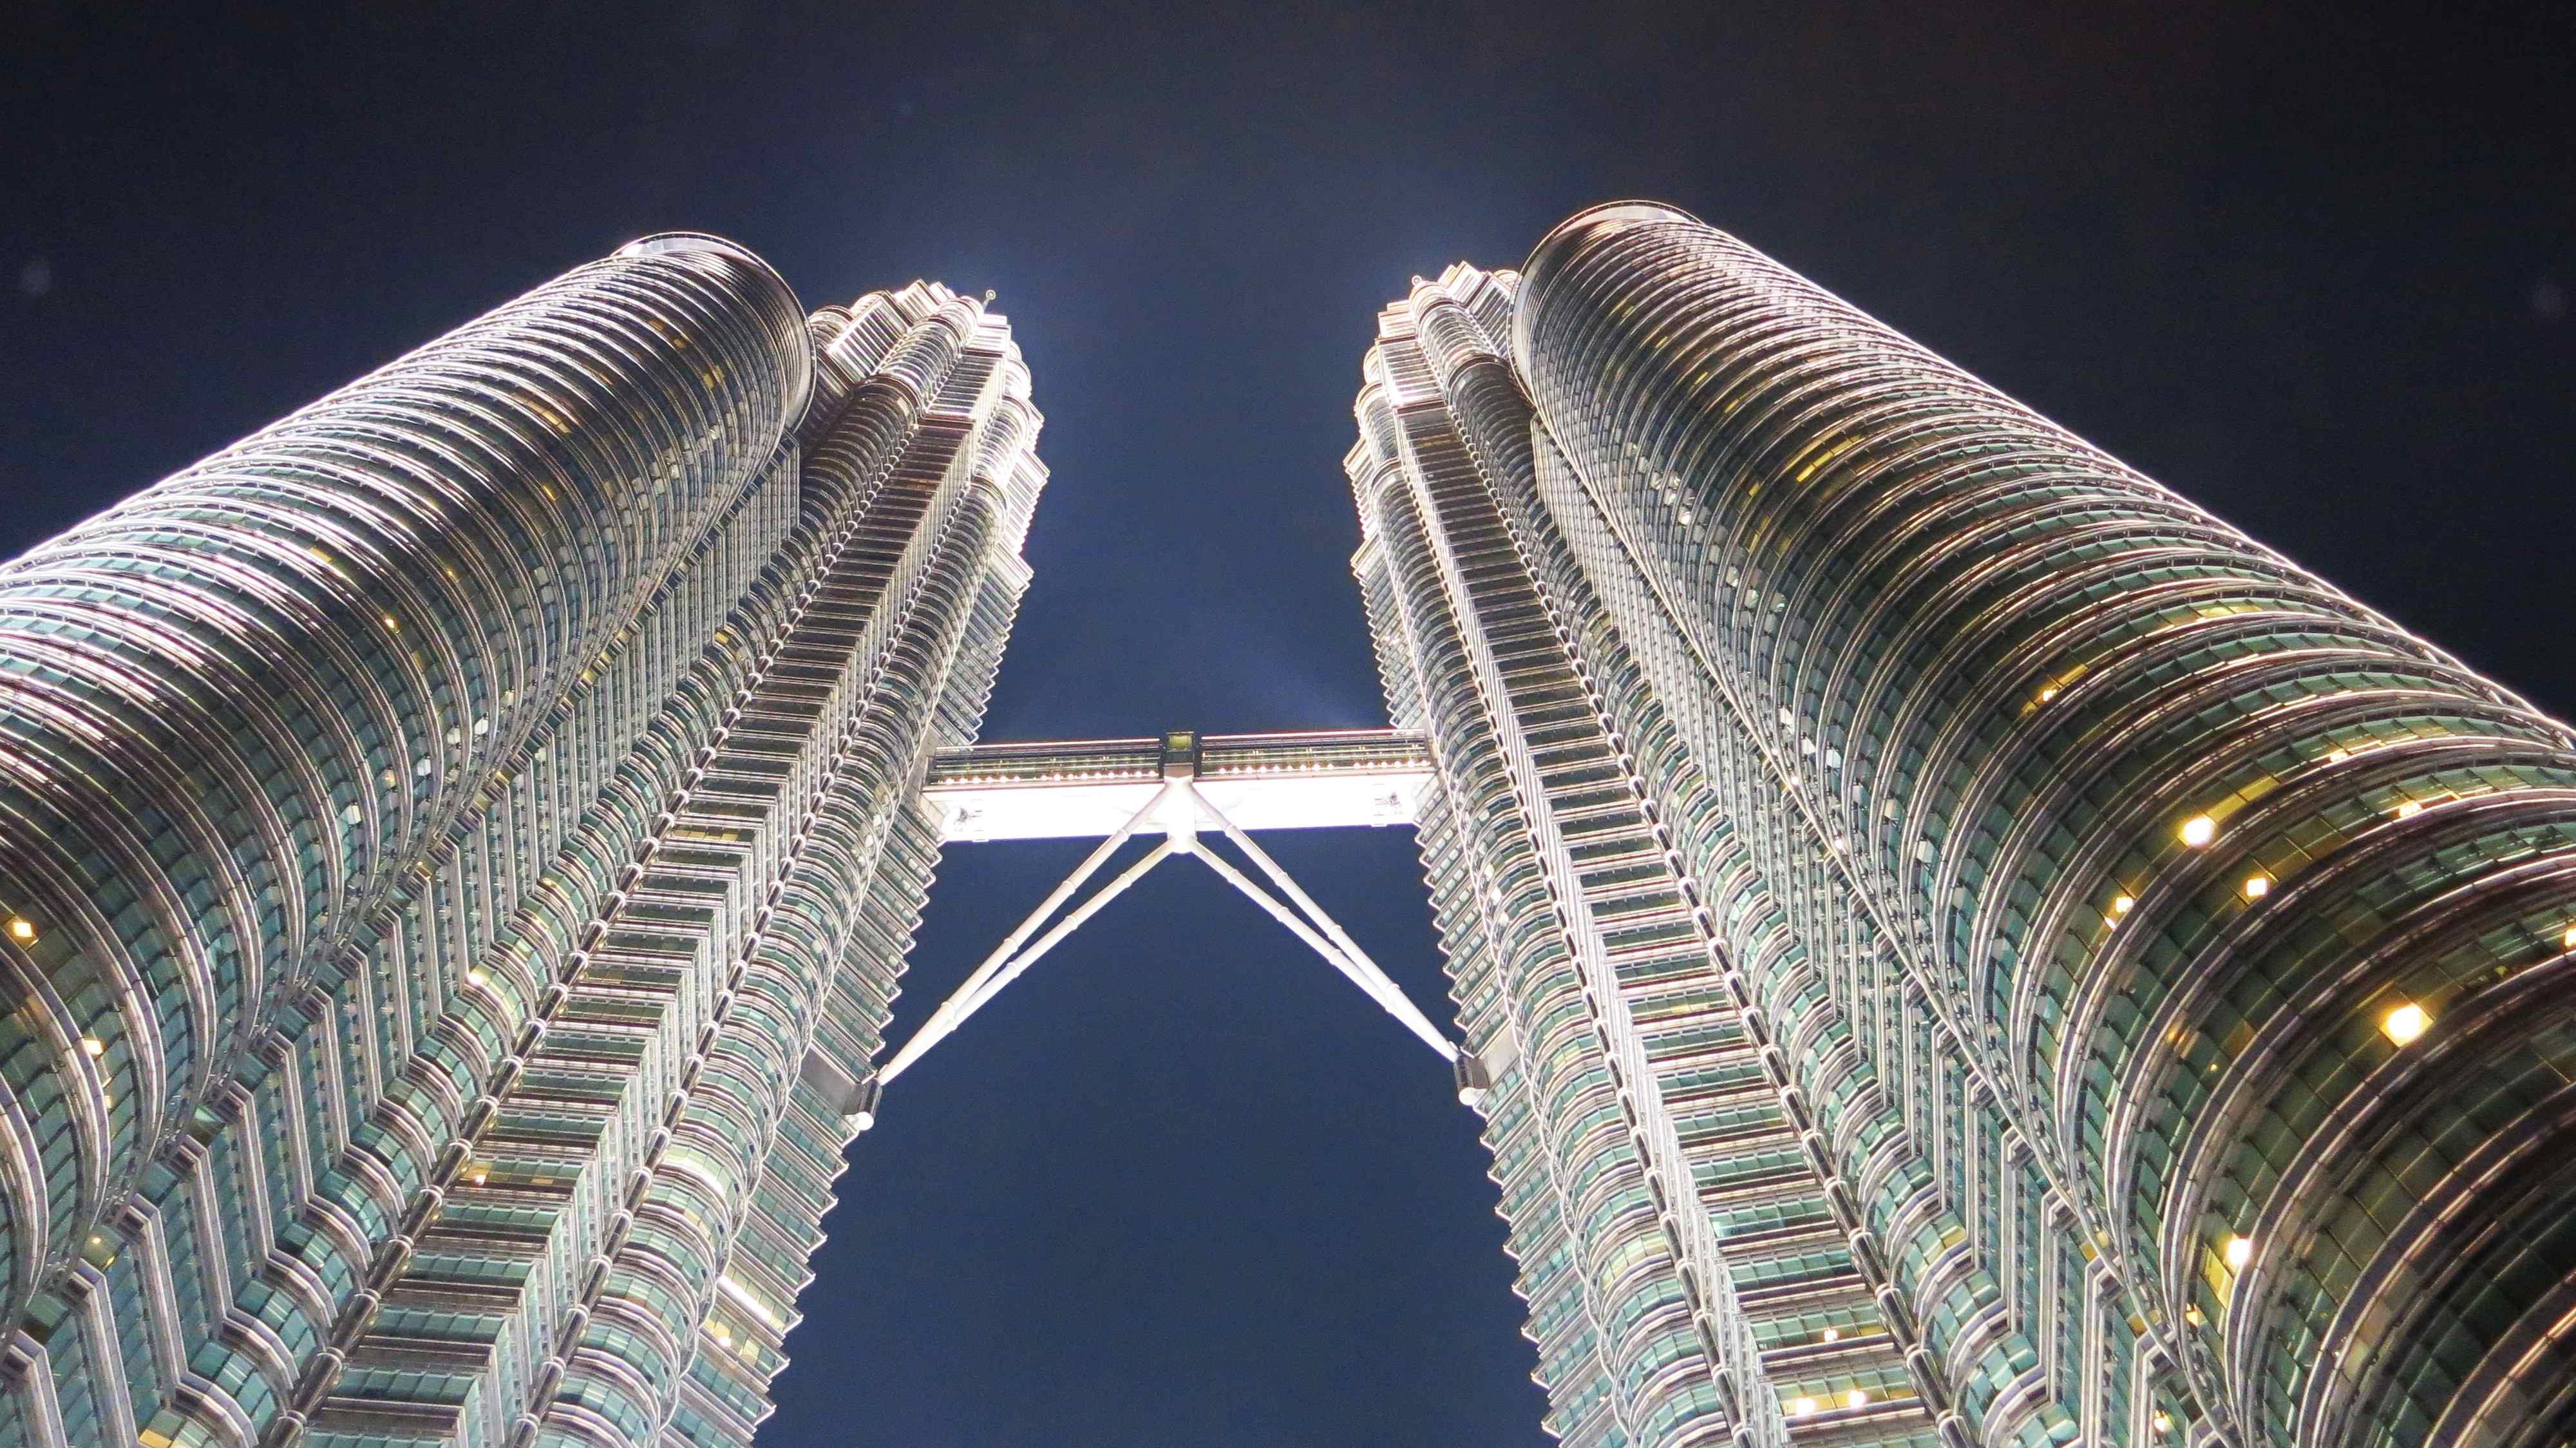 Kuala Lumpur – Malaysia – Bukit Bintang Centro Petronas Towers